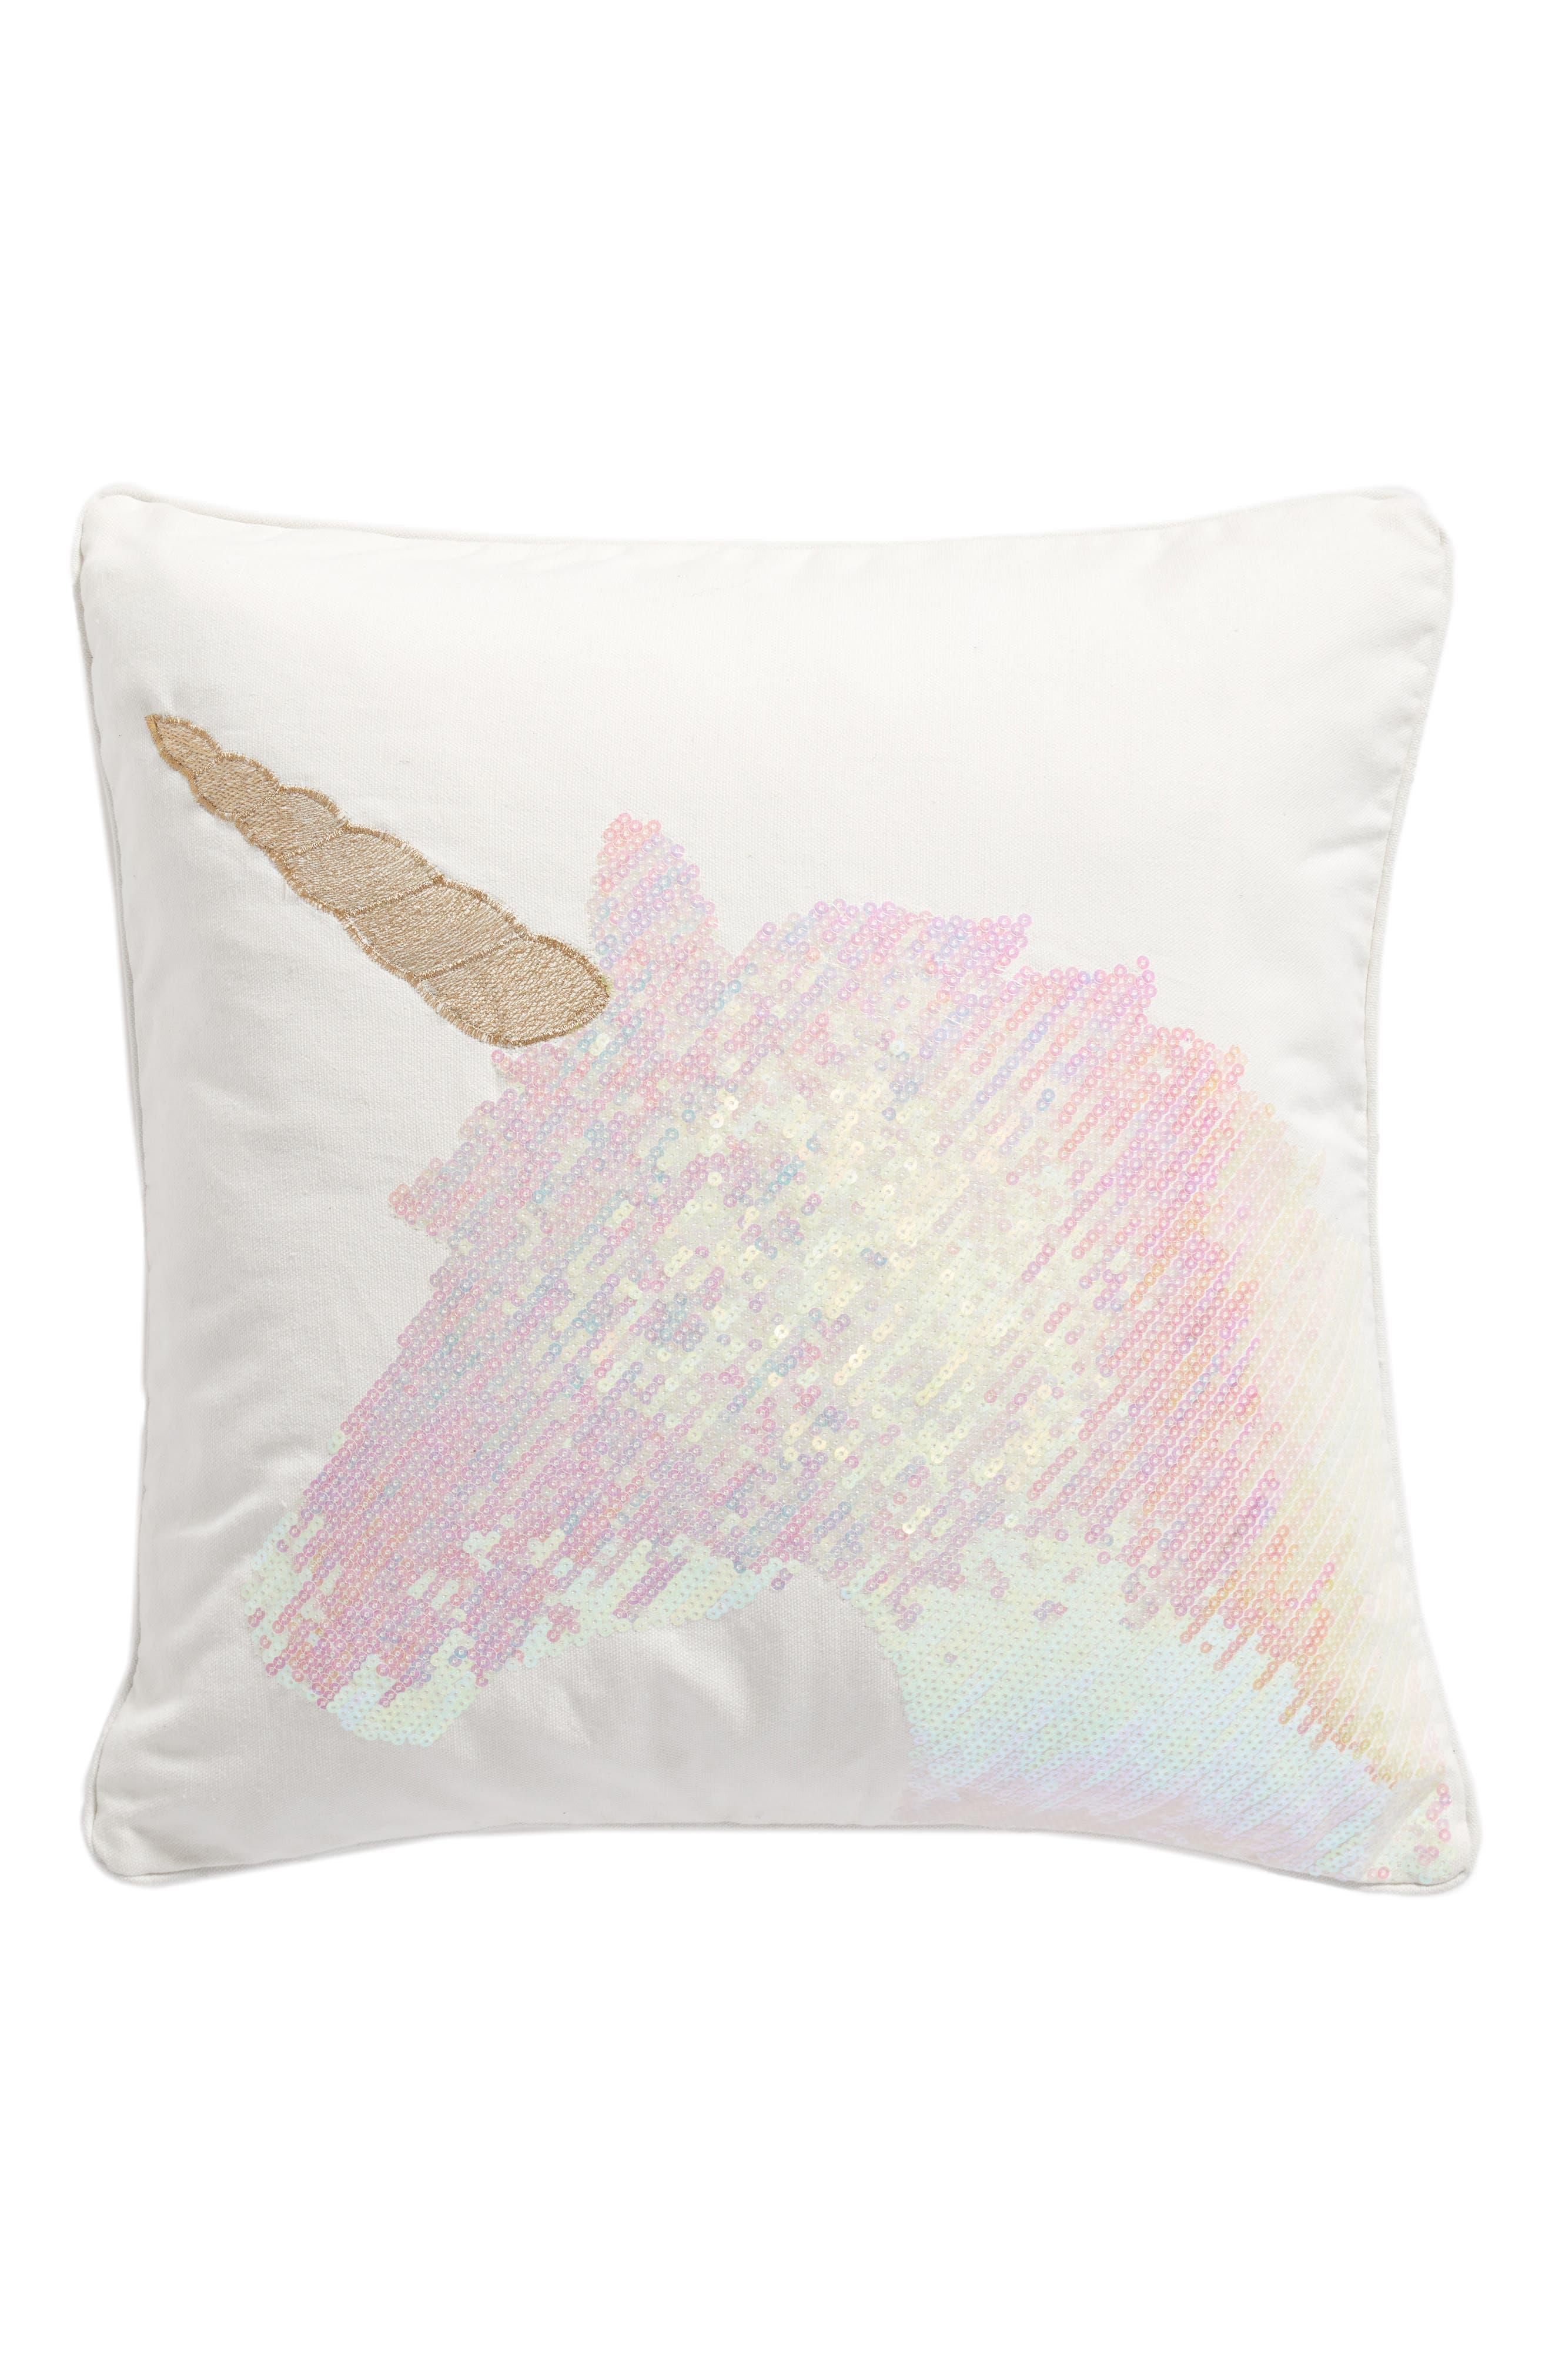 Levtex Unicorn Sequin Pillow